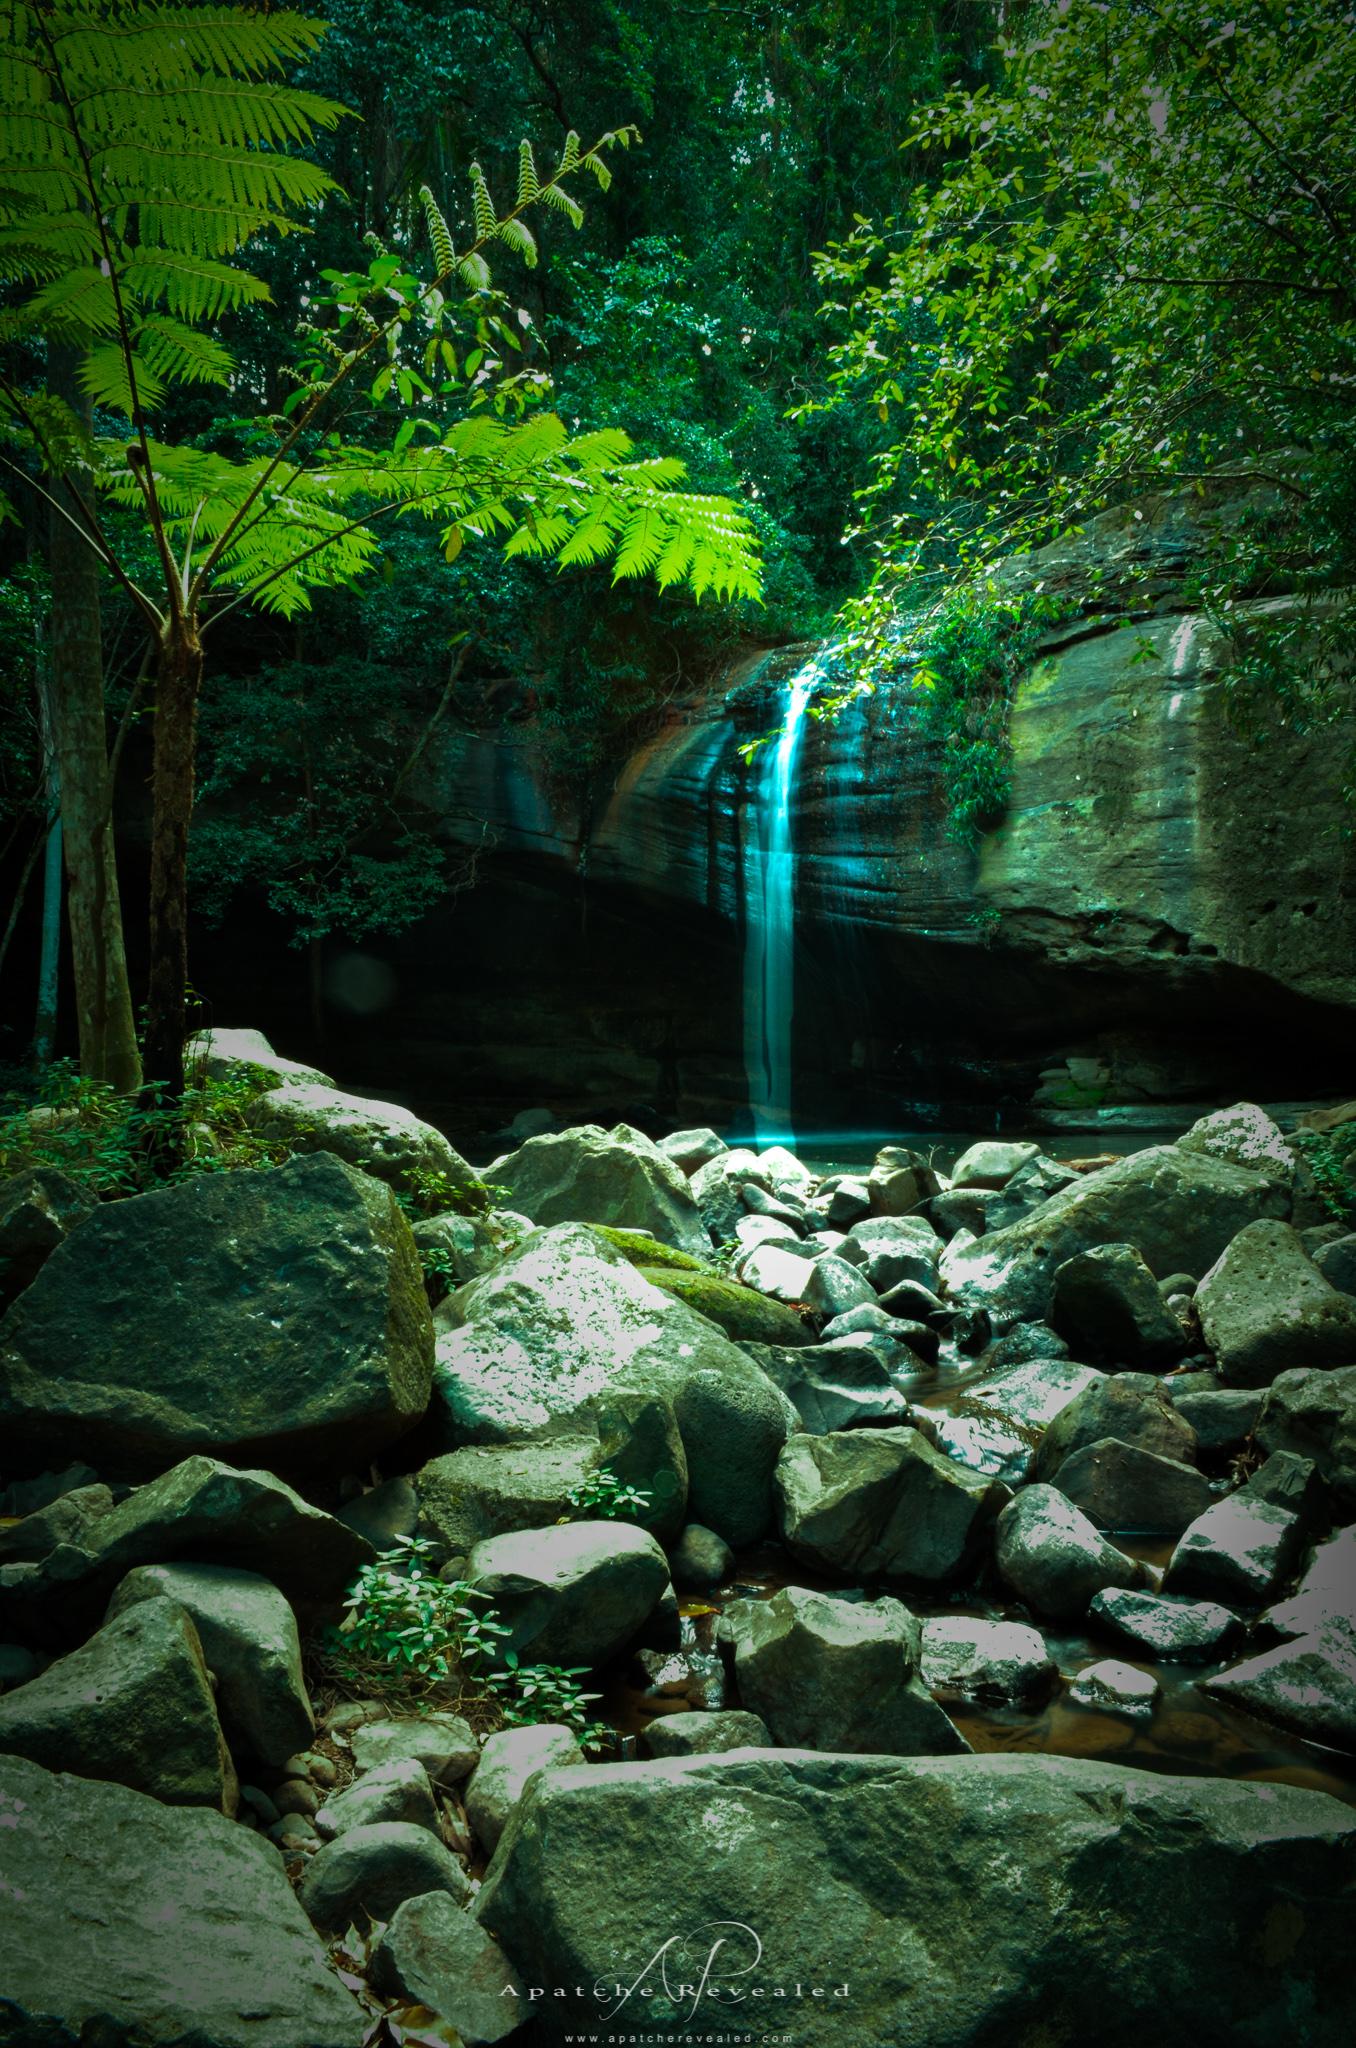 Kandola falls